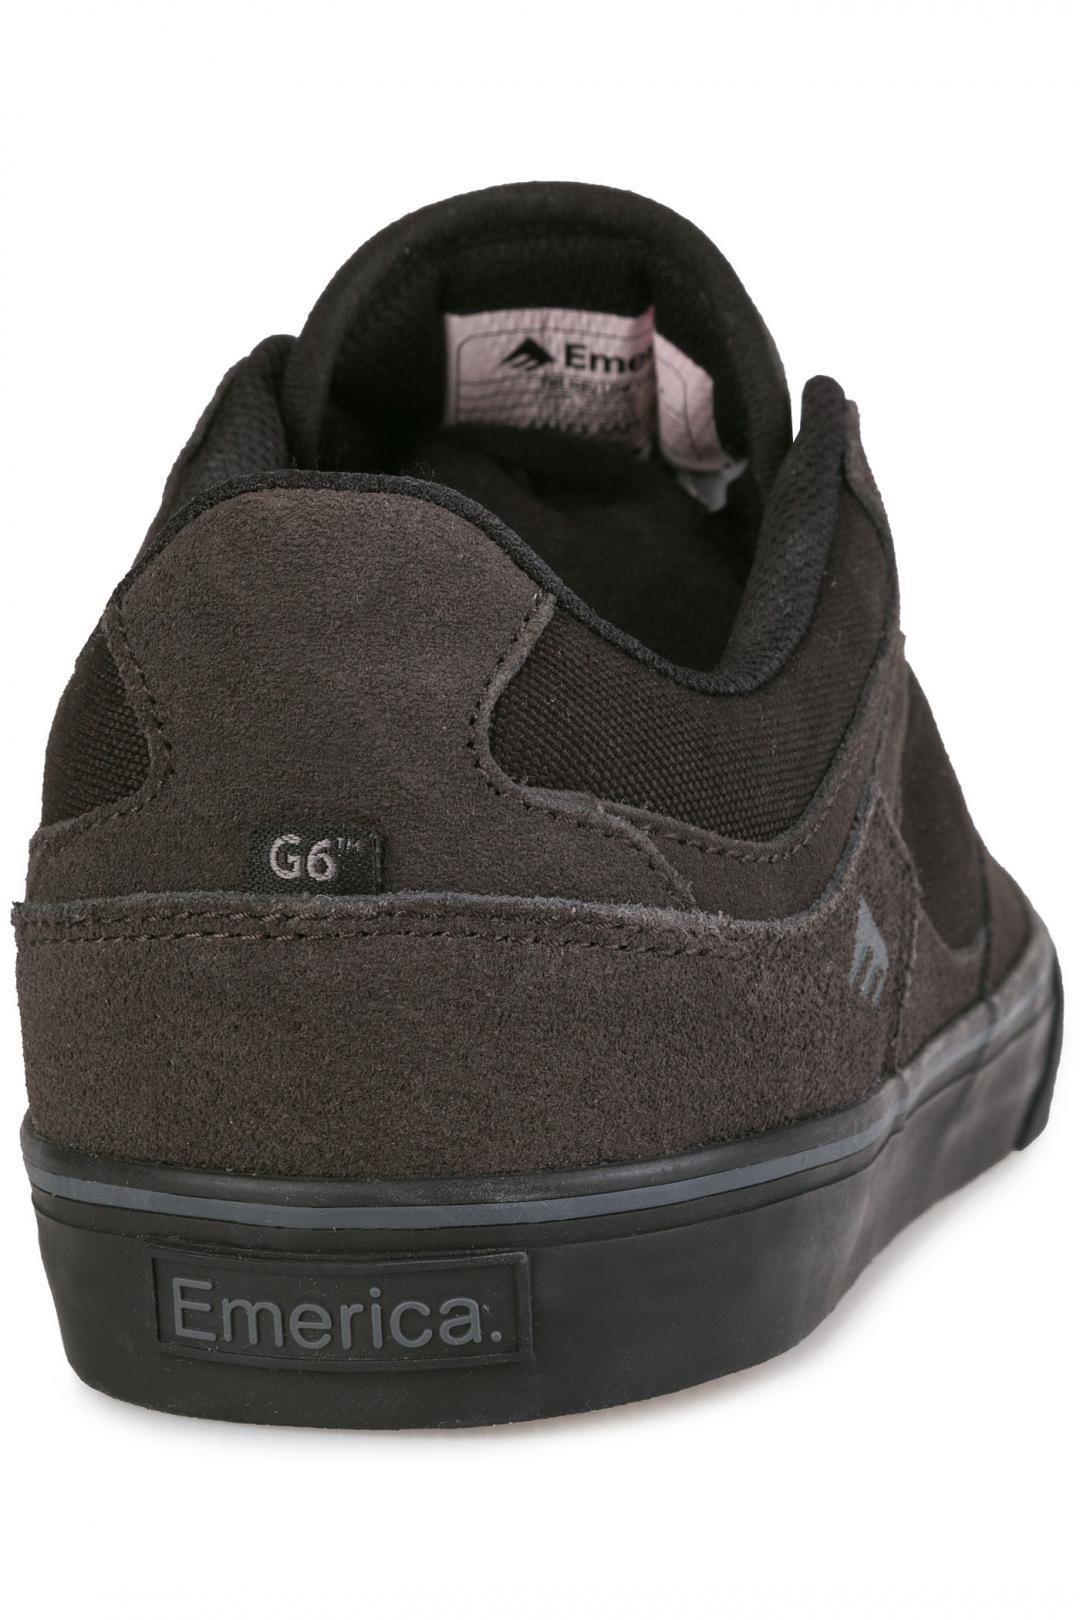 Uomo Emerica The HSU Low Vulc dark grey black | Scarpe da skate